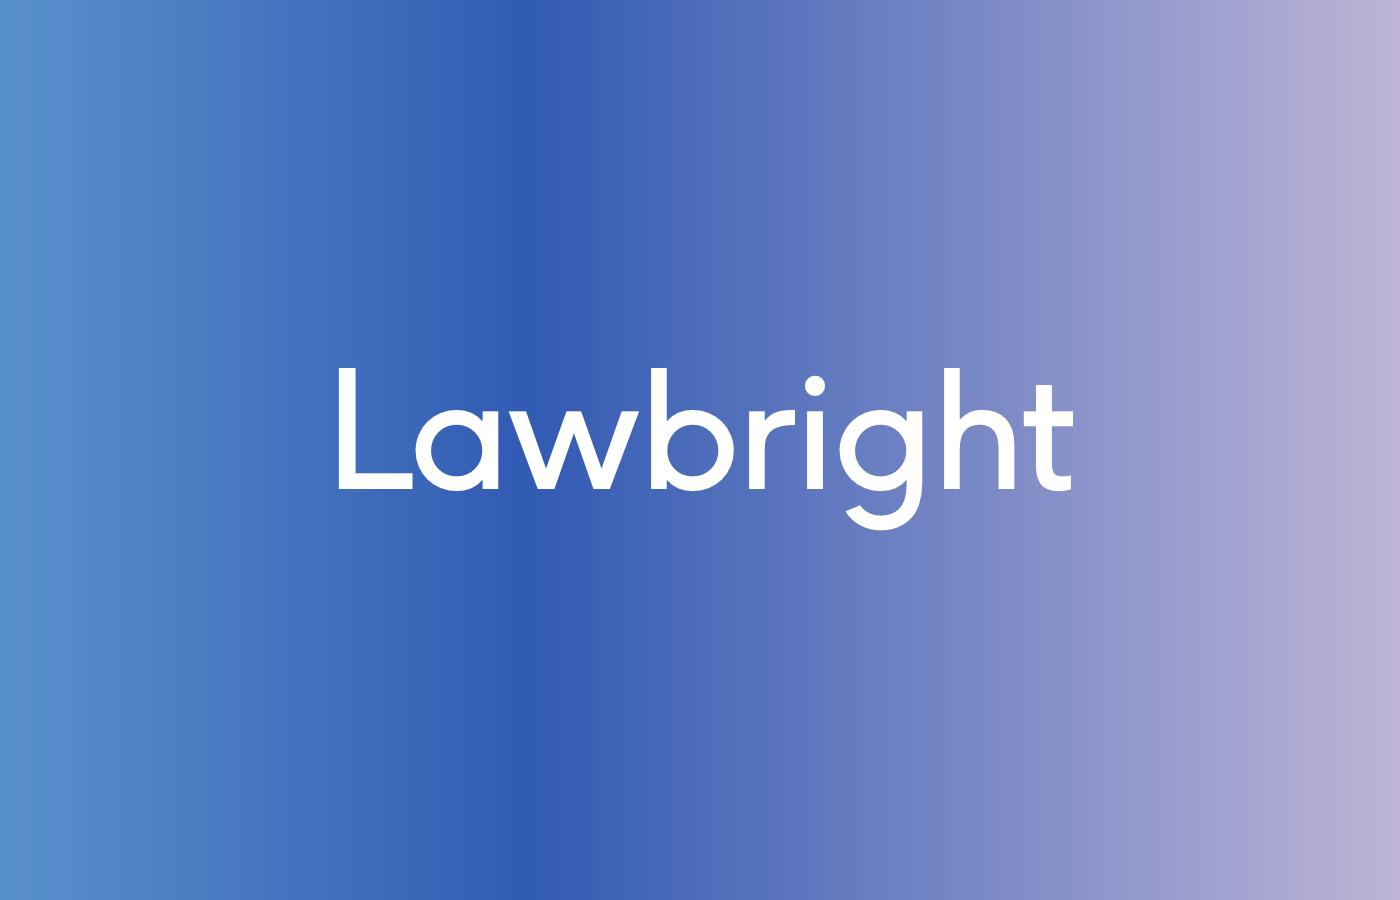 New client: Lawbright